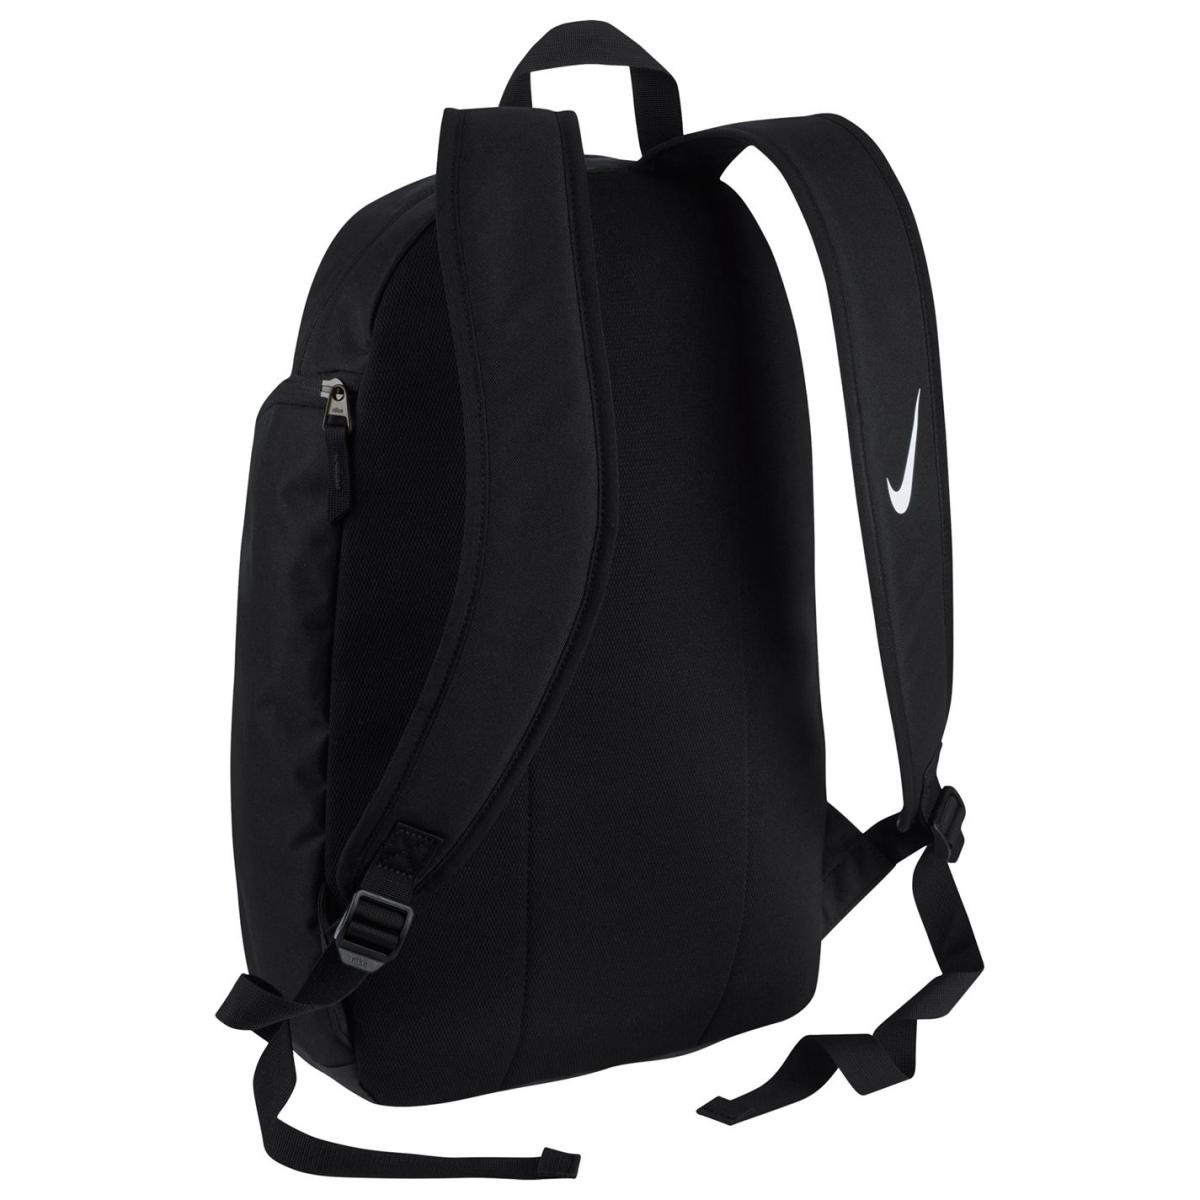 Nike Academy Rucksack Schulrucksack Sport Reisen Wandern Backpack 1025